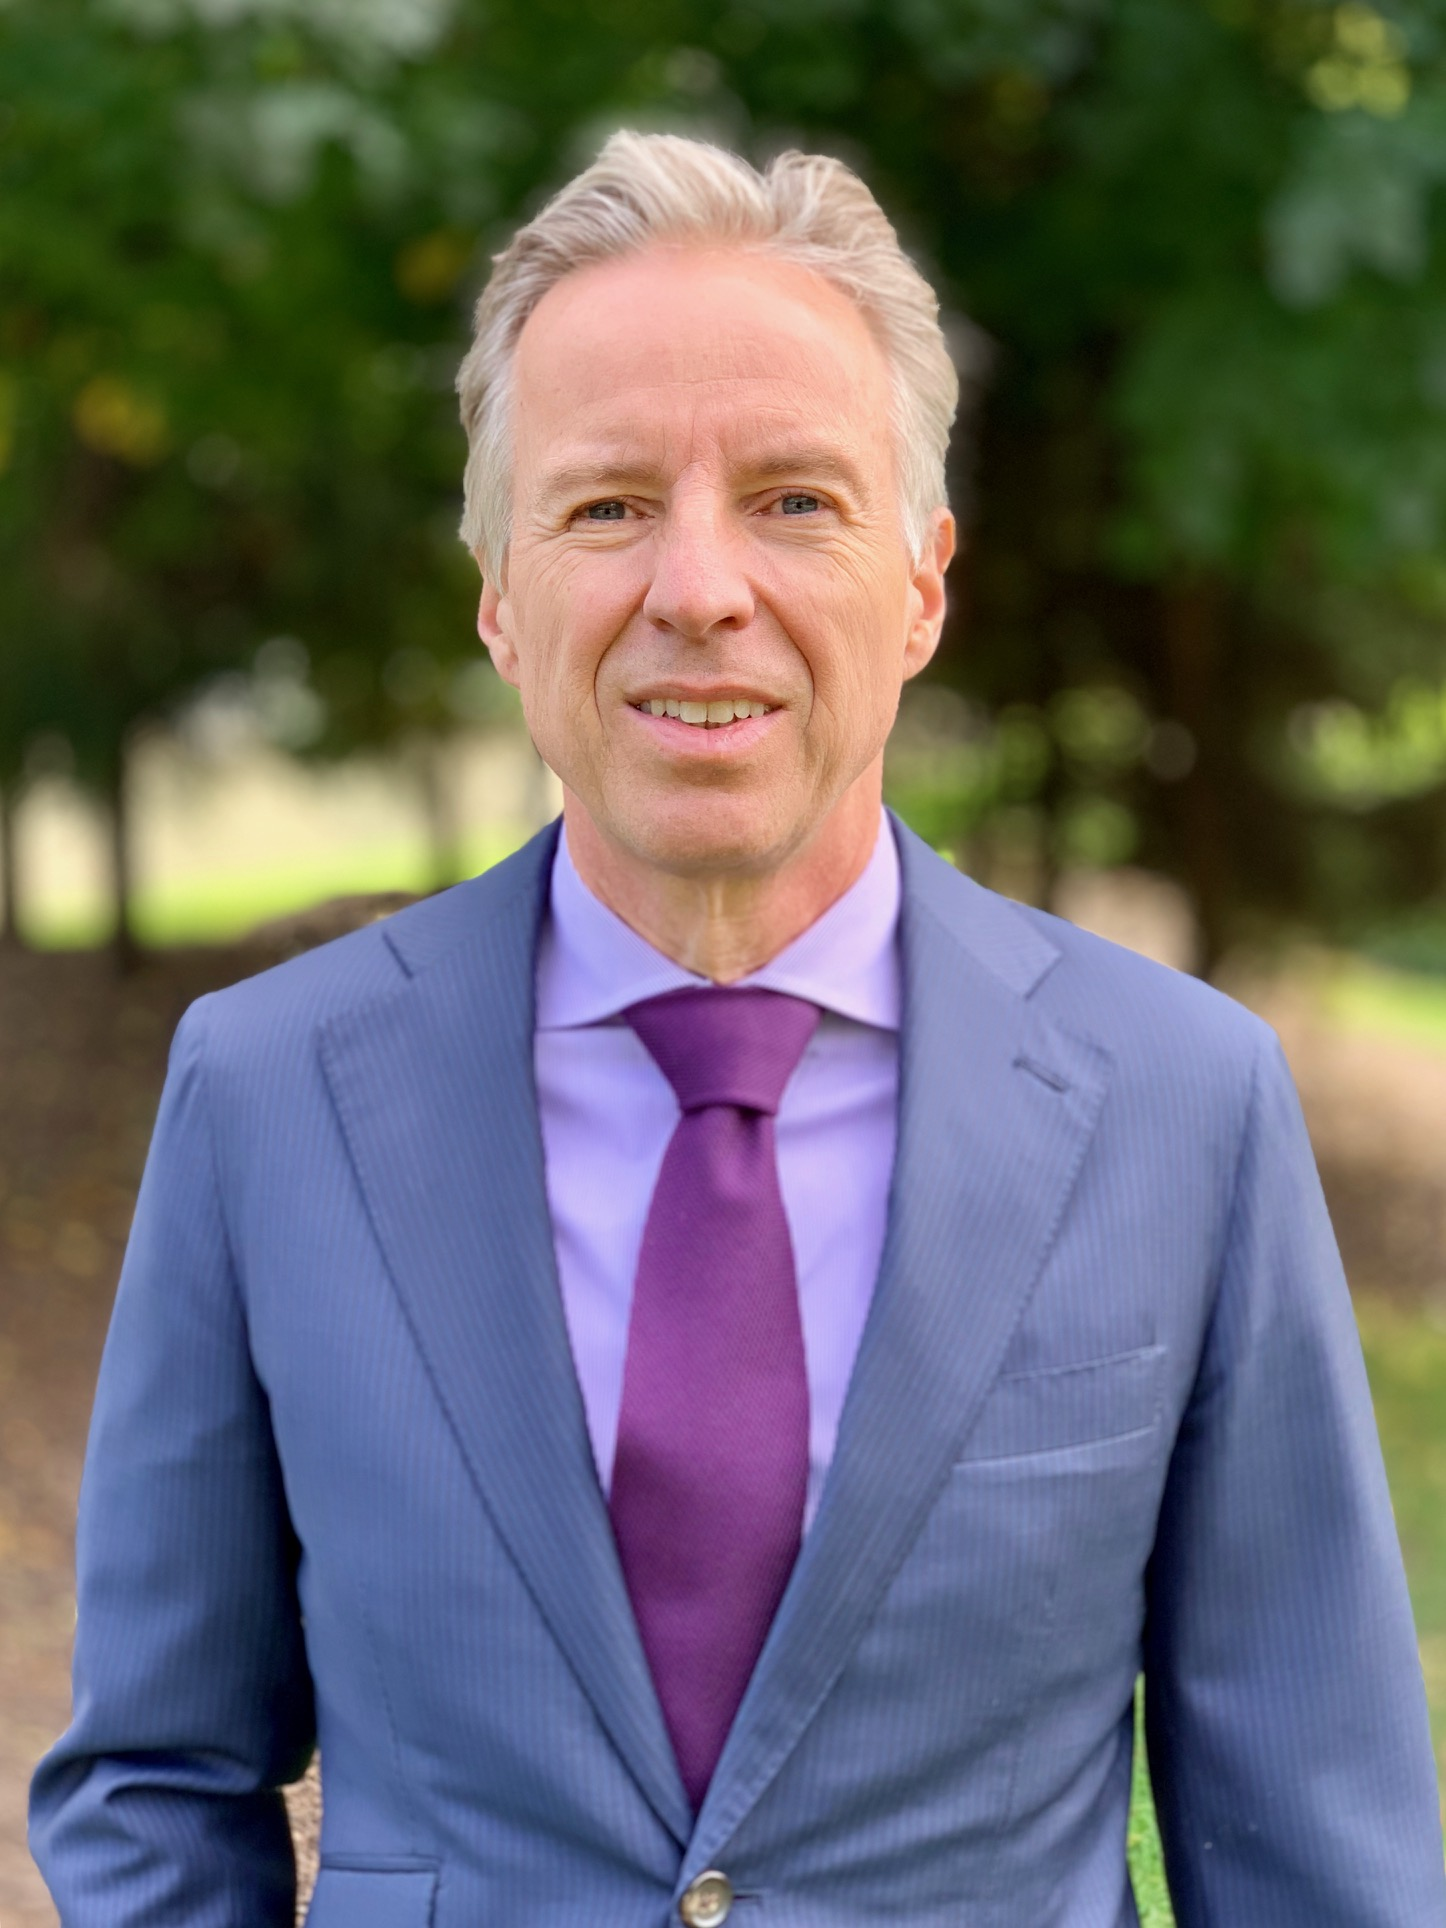 Michael Diefenbach, PhD, SBM president